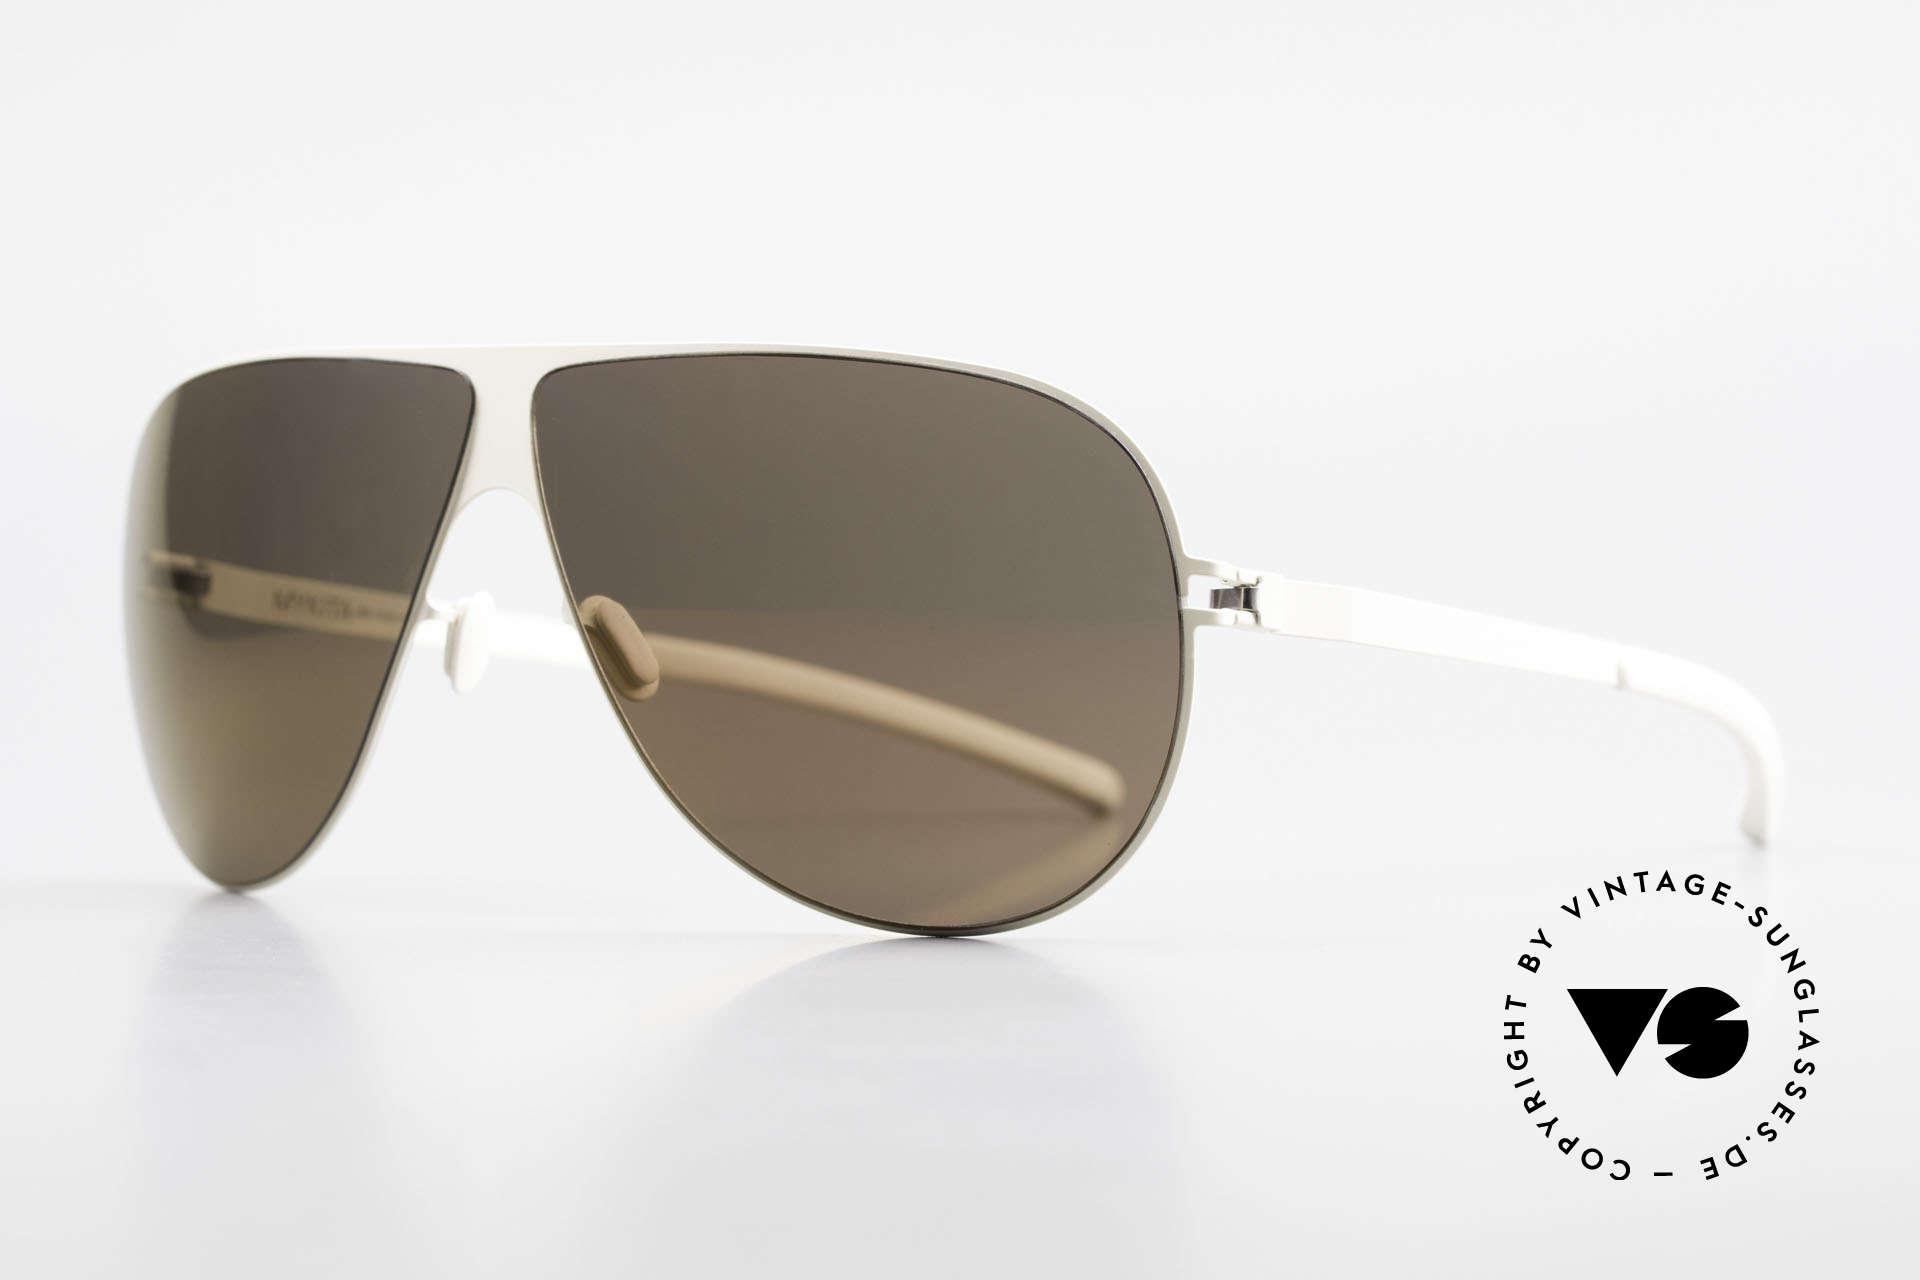 Mykita Elliot Tom Cruise Mykita Sunglasses, top-notch quality, made in Germany (Berlin-Kreuzberg), Made for Men